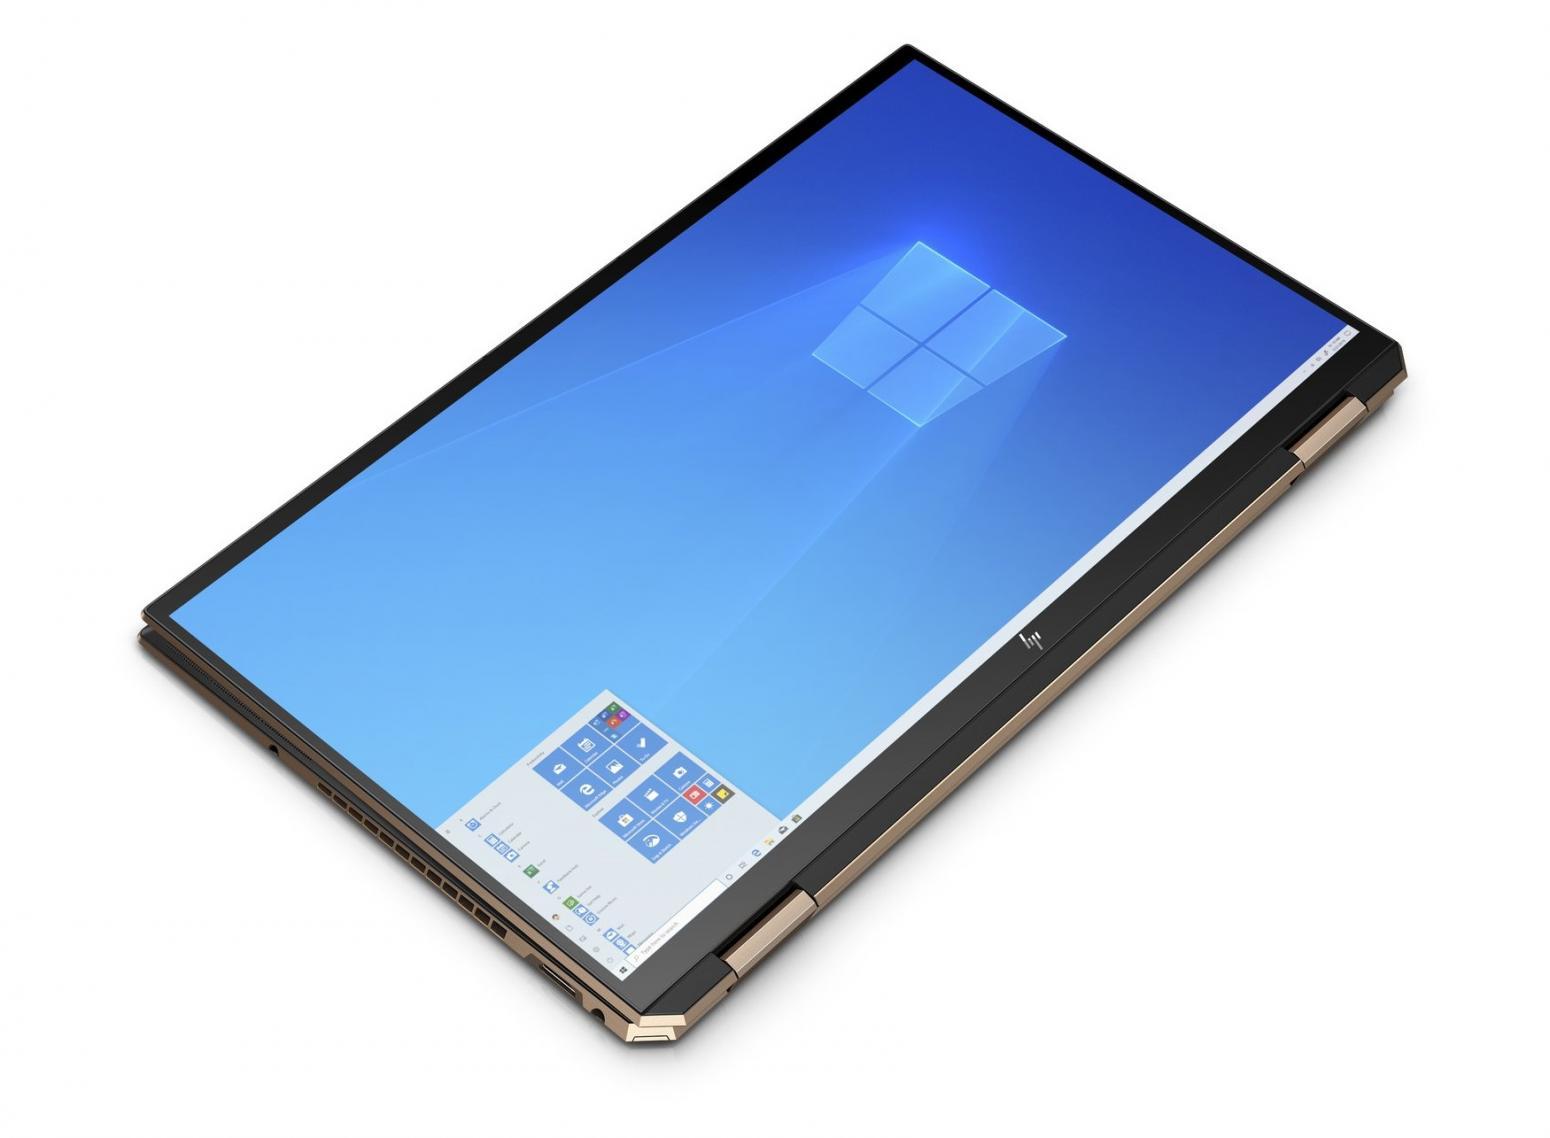 Ordinateur portable HP Spectre x360 15-eb0013nf Noir - Tactile 4K OLED, GTX 1650 Ti Max-Q - photo 3